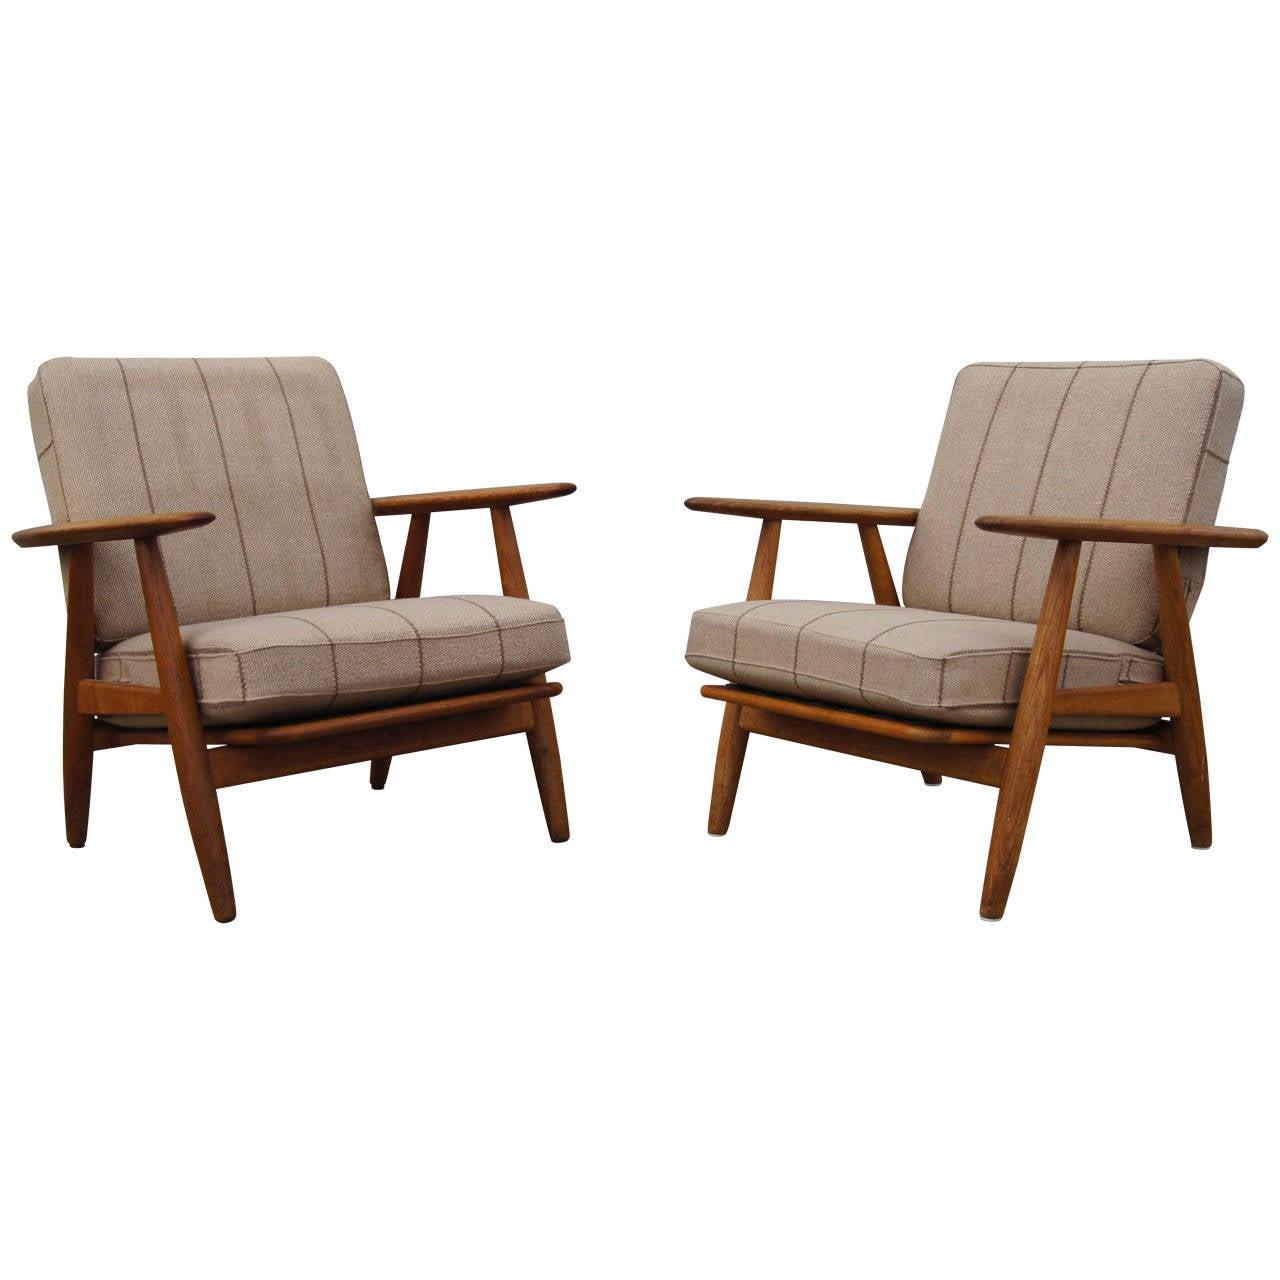 Pair of GE-240 Lounge Chairs by Hans Wegner for GETAMA